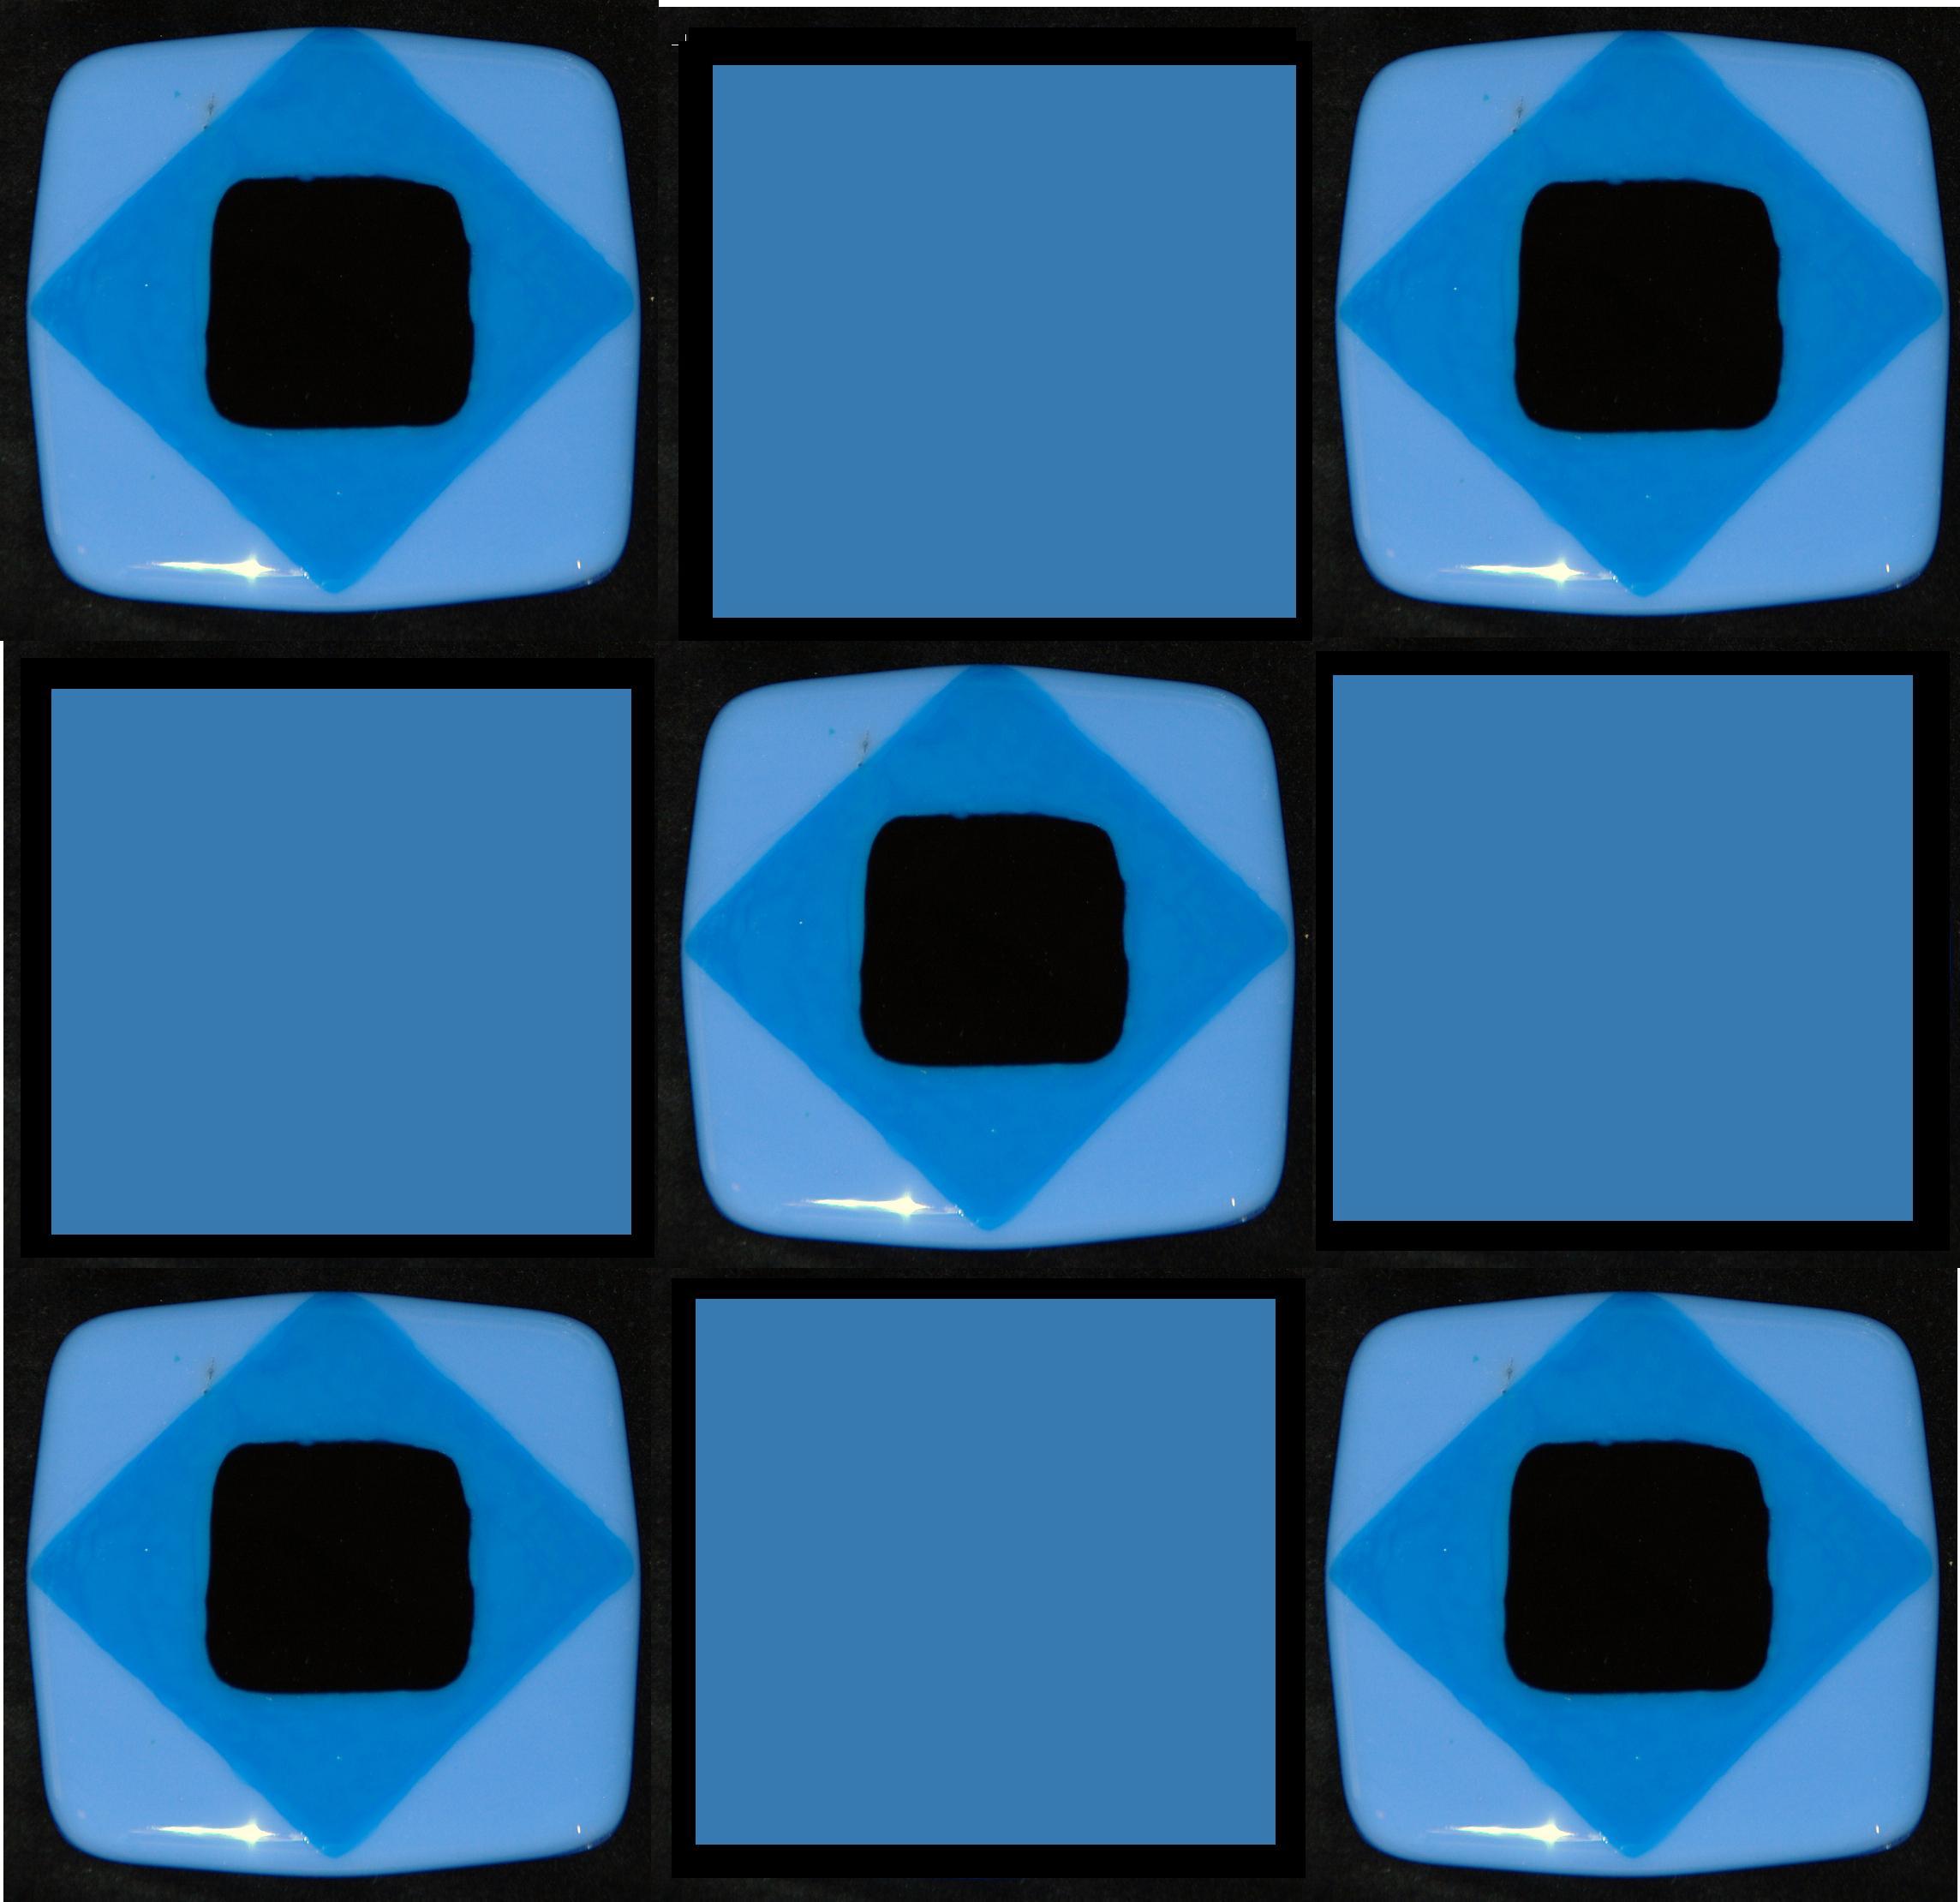 peri on black tiles with dark blue.jpg